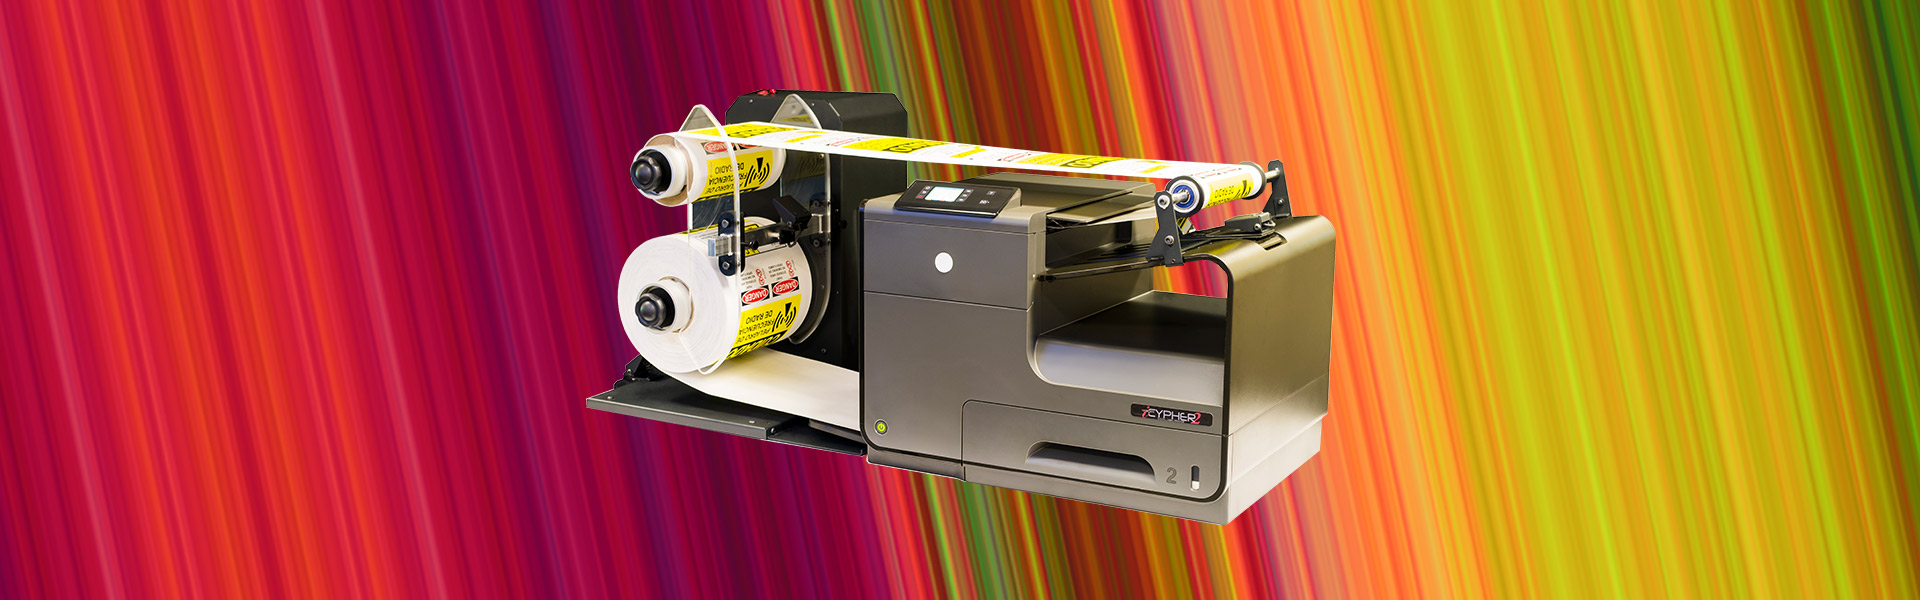 itech Cypher Etikettendrucksystem